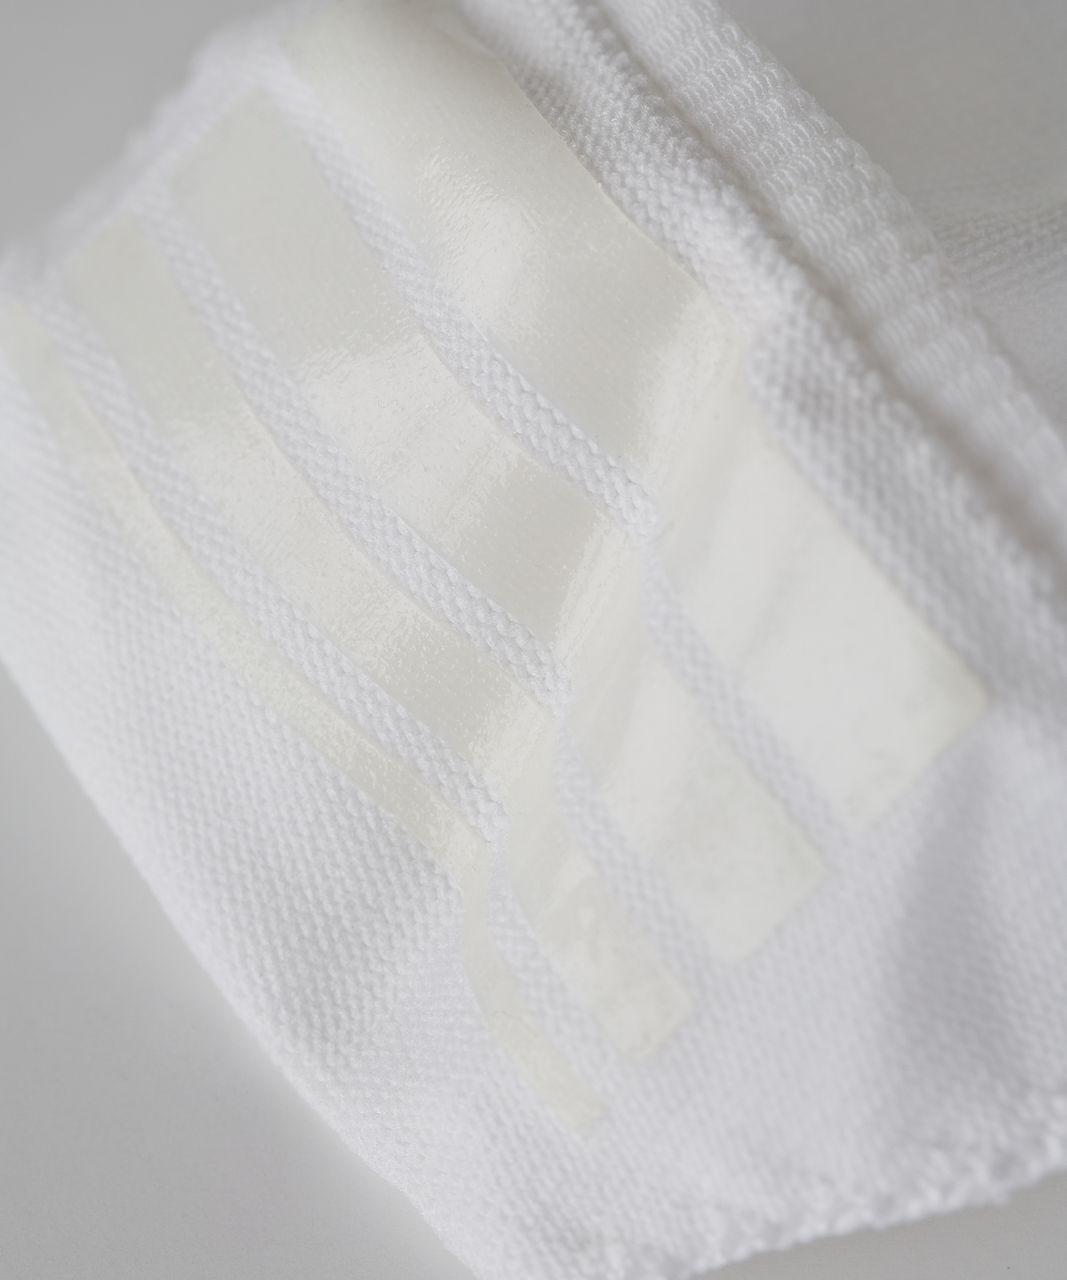 Lululemon Secret Sock - White / Silver Spoon